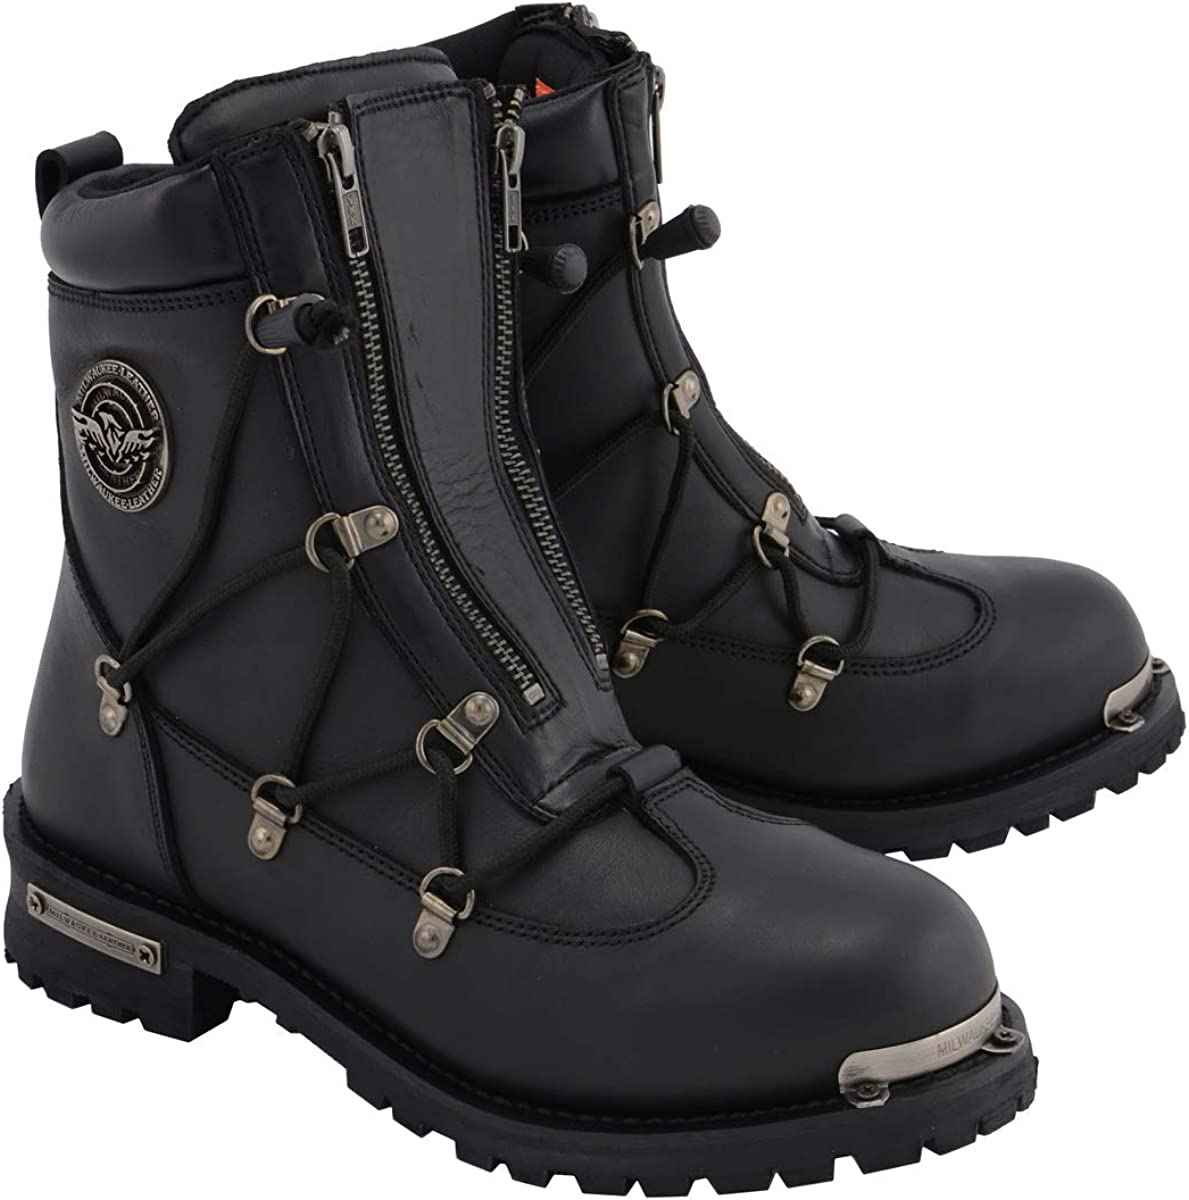 Price reduction Milwaukee Leather MBM9075 Men's Black Toe Zipp Dual New arrival 6-inch Plain